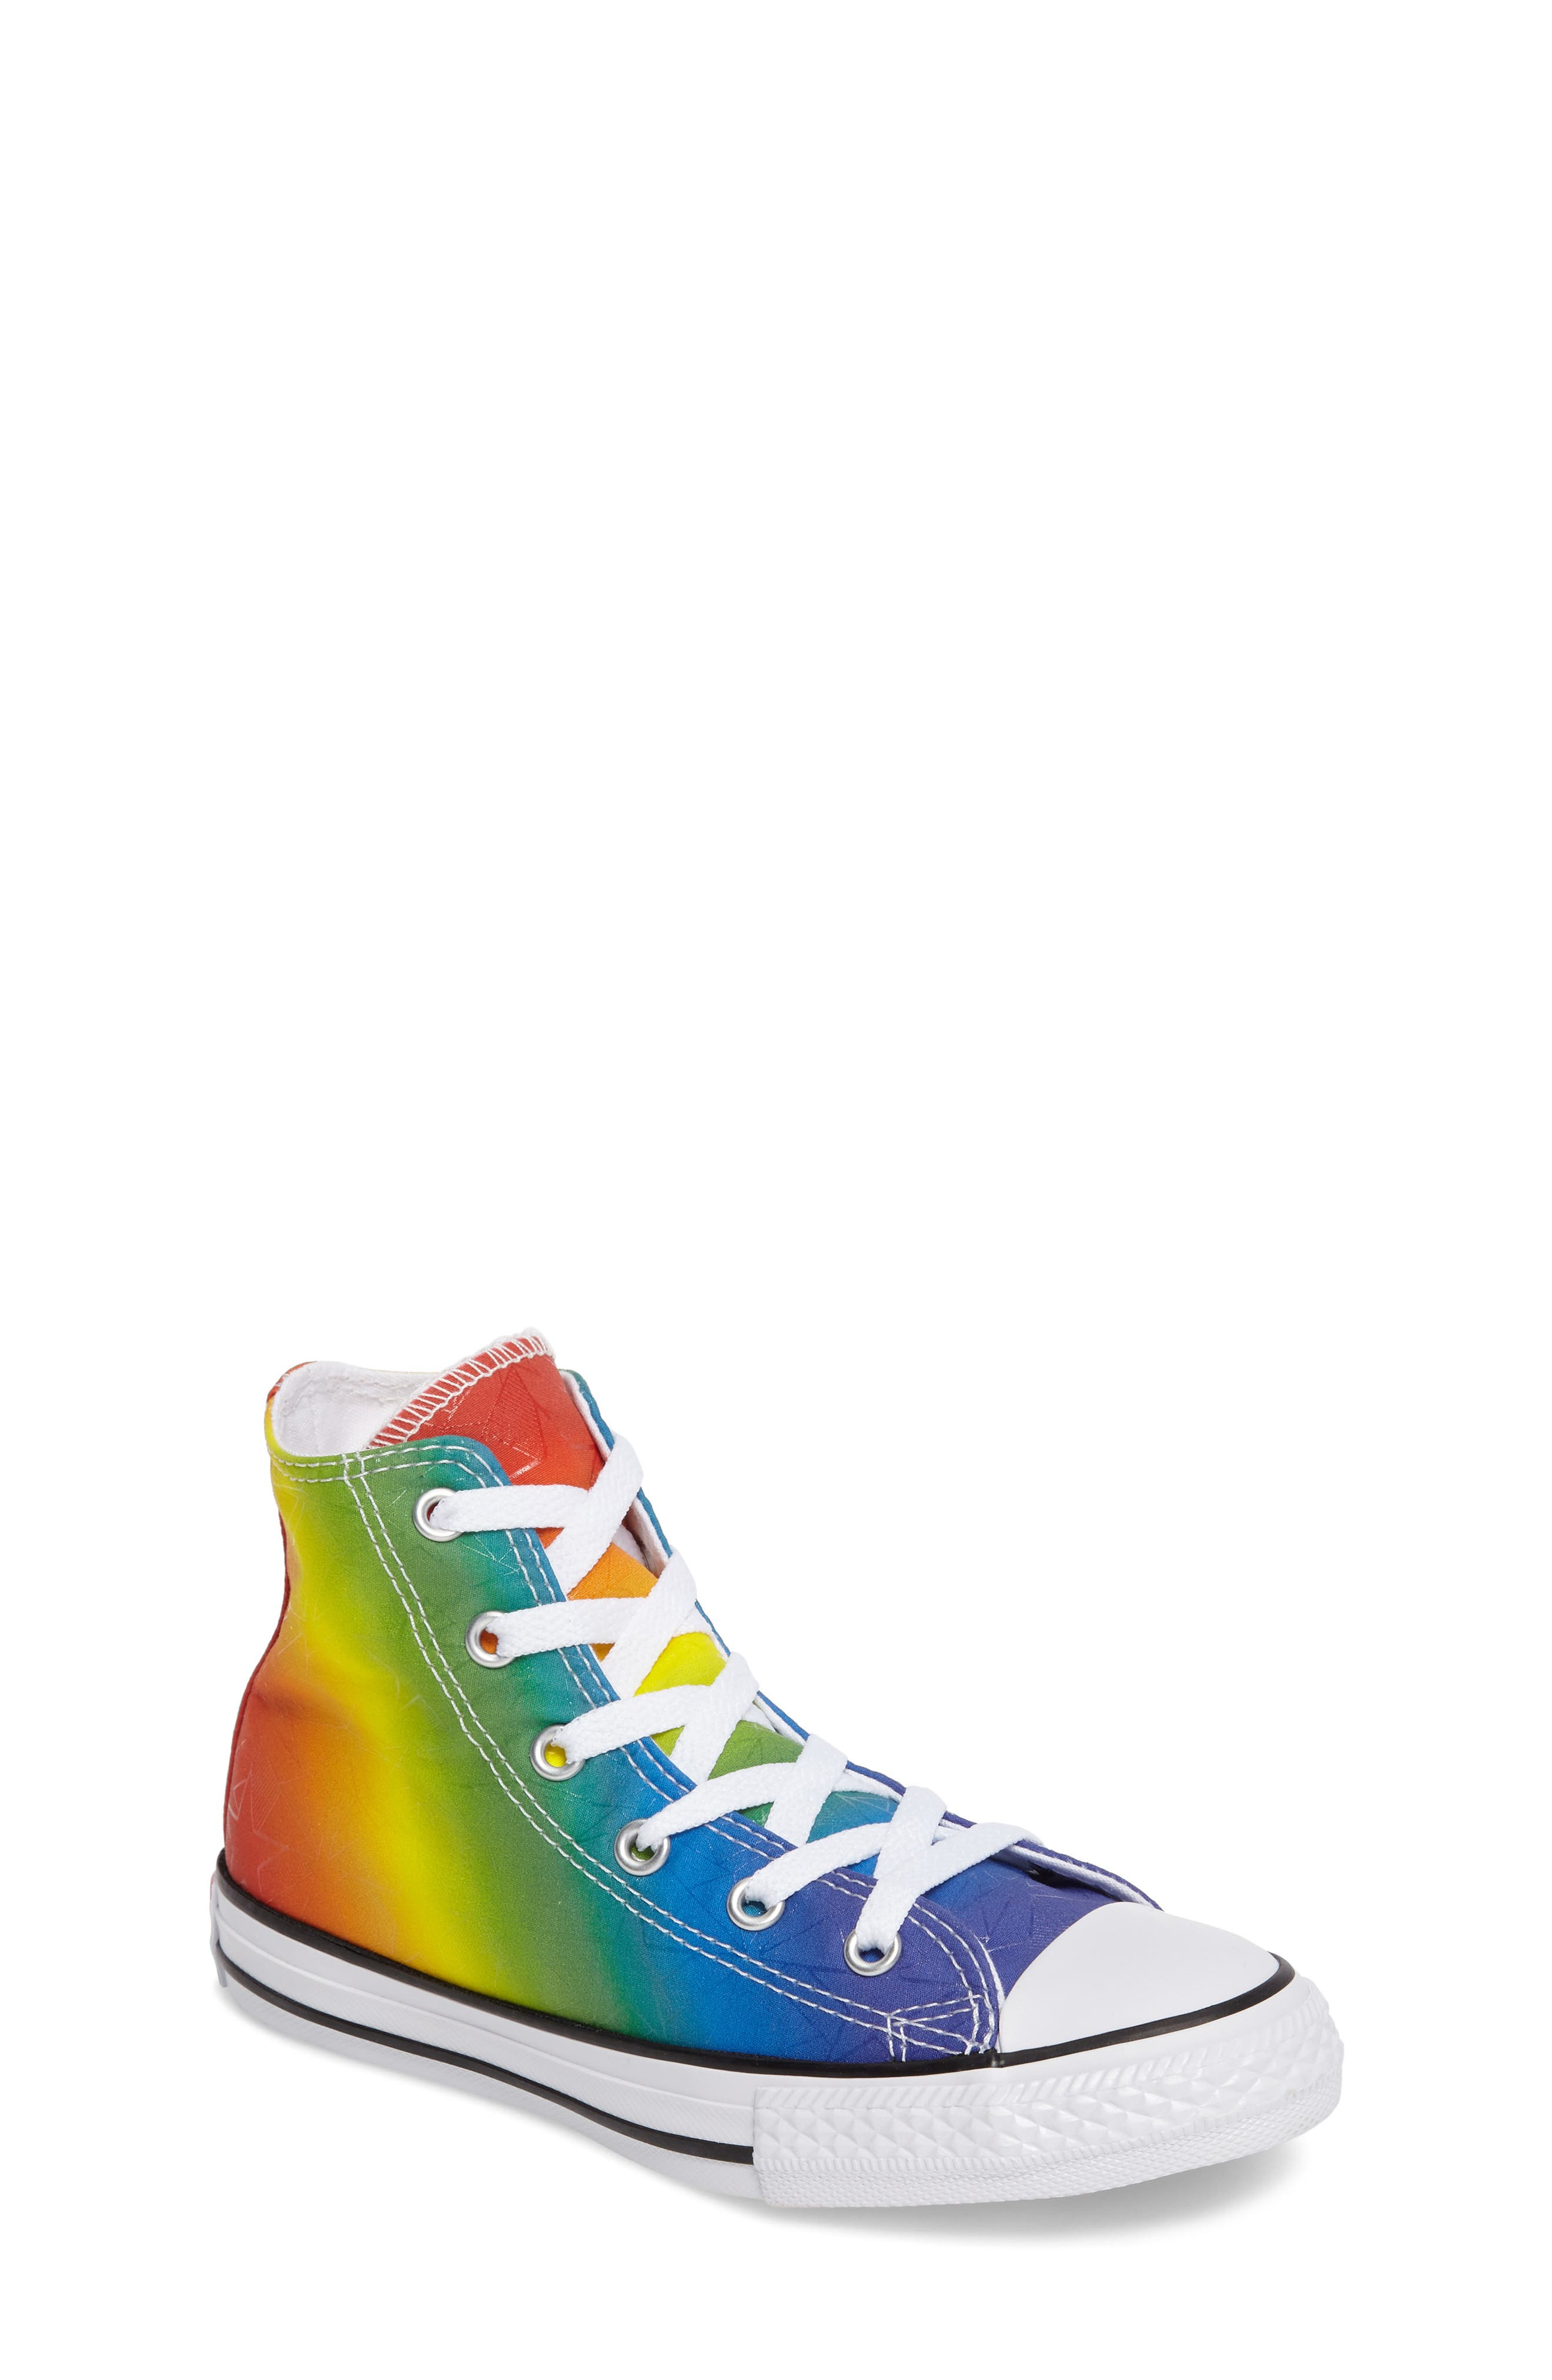 Converse Chuck Taylor 174 All Star 174 Pride High Top Sneaker